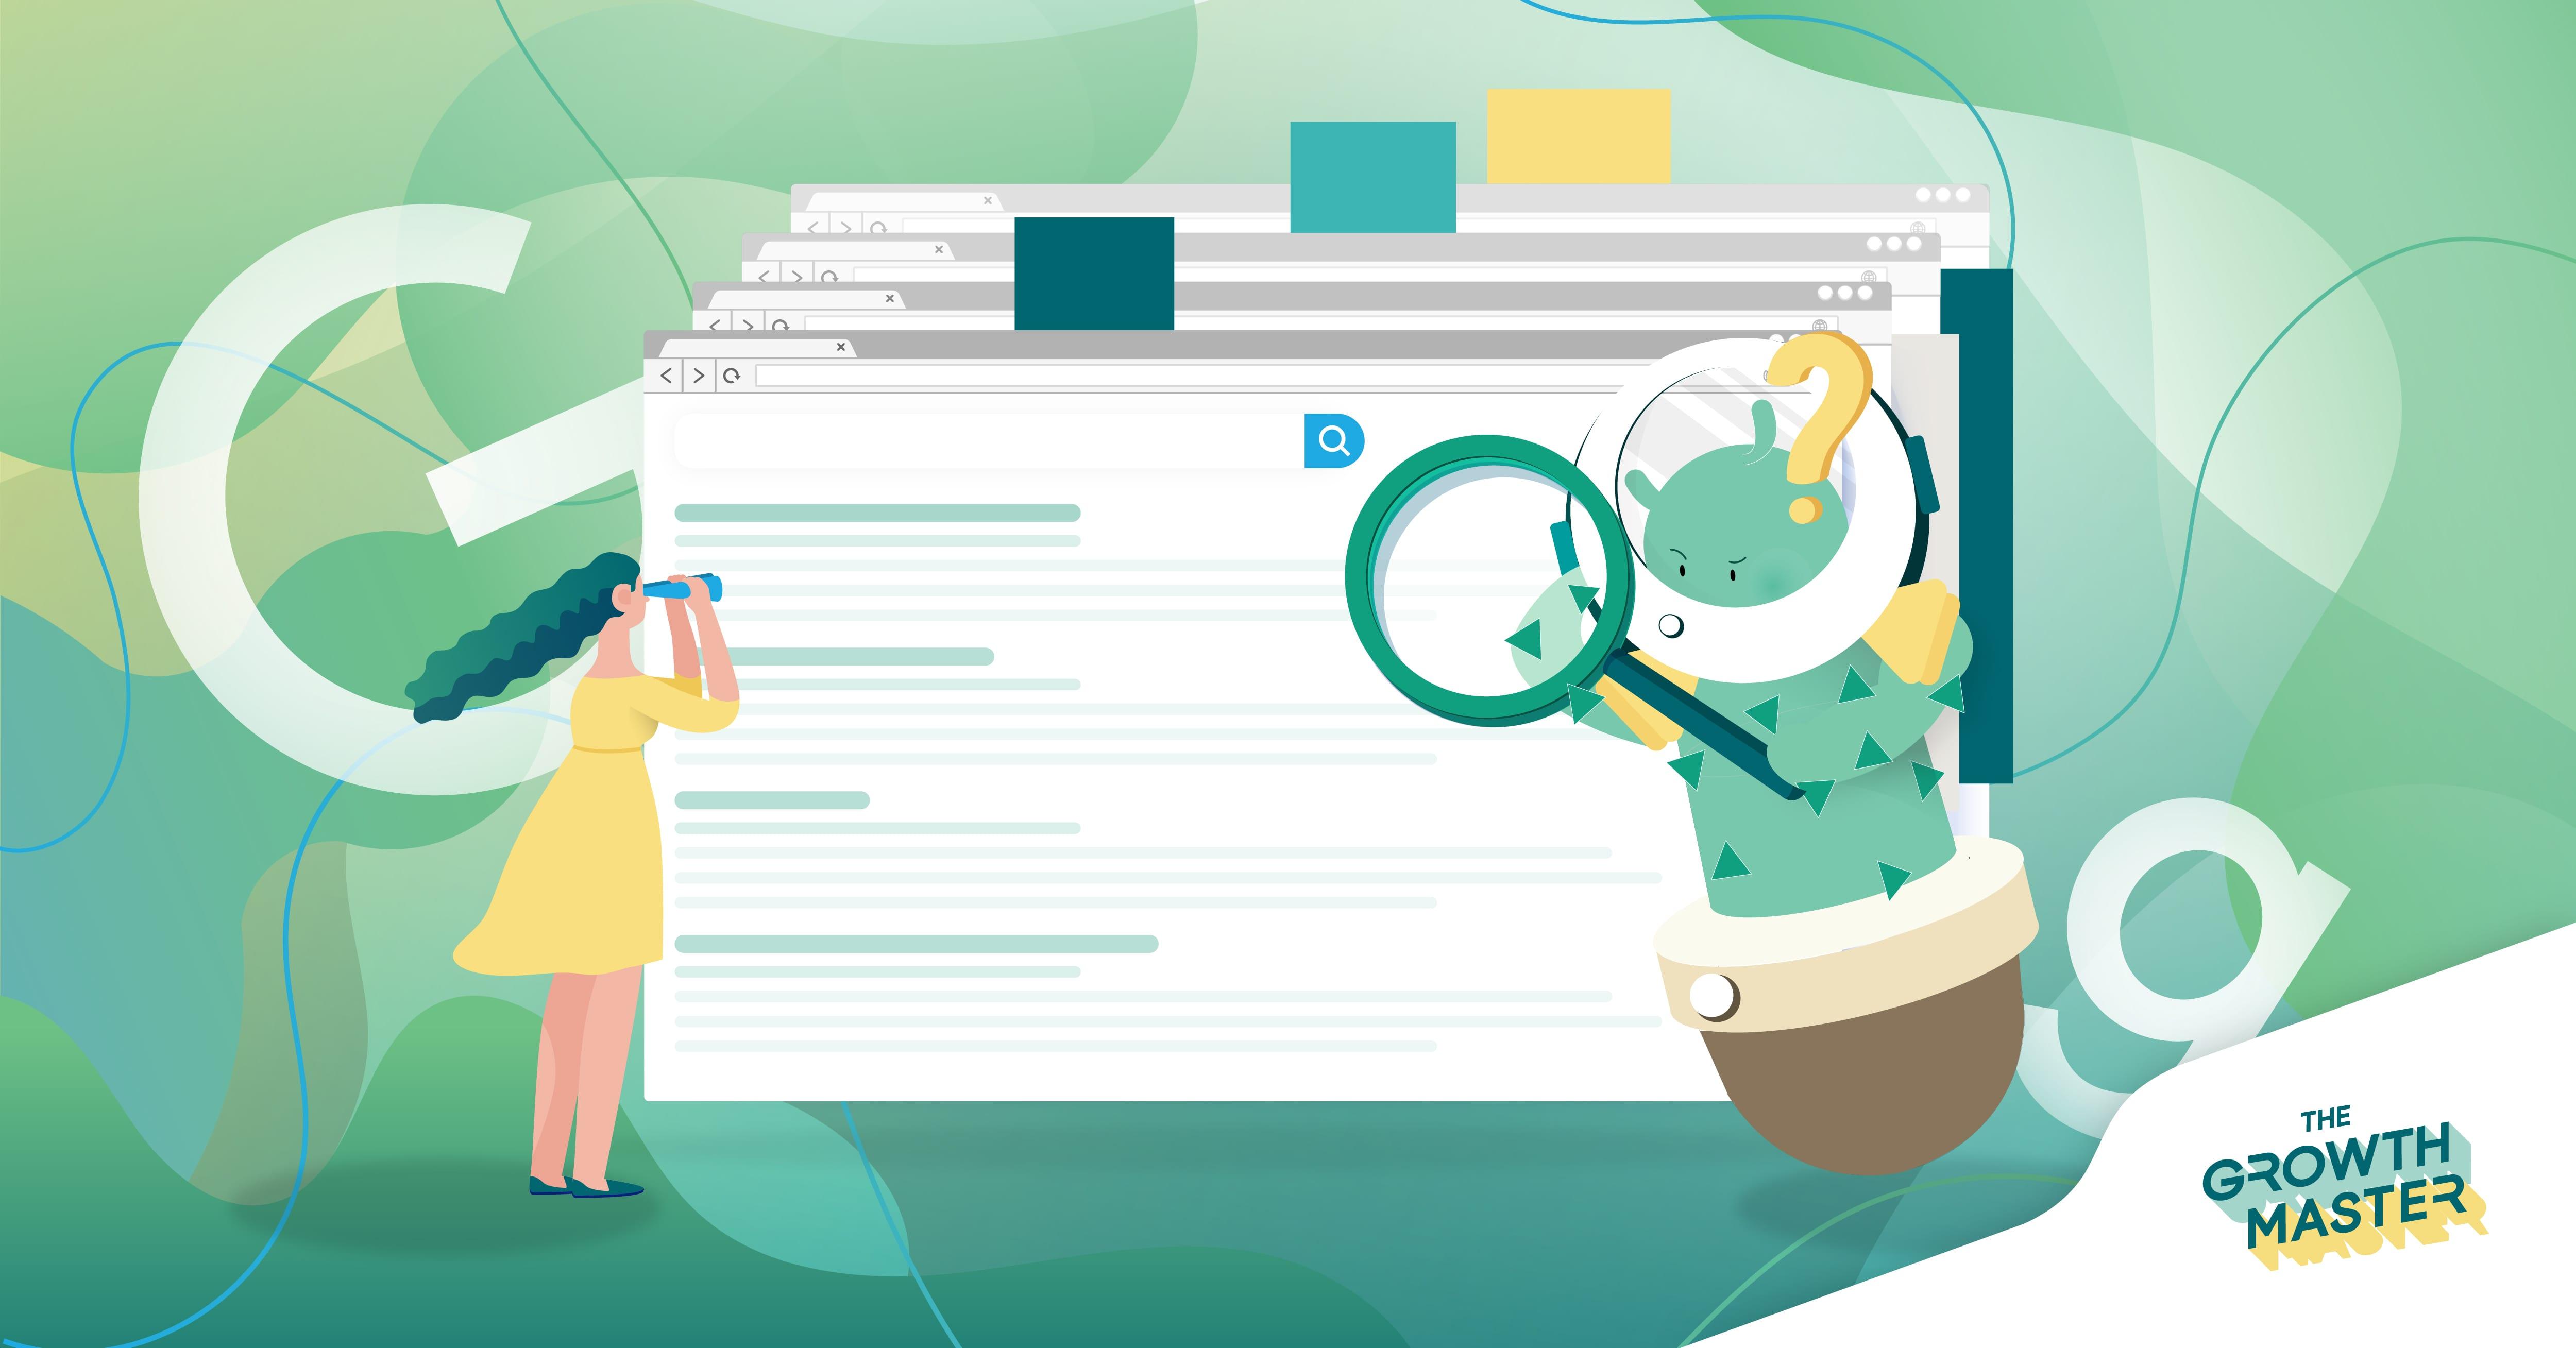 Meta Tags Guide : เรียนรู้การใช้งาน Meta Tags ให้การทำ SEO ของคุณมีประสิทธิภาพมากกว่าเดิม